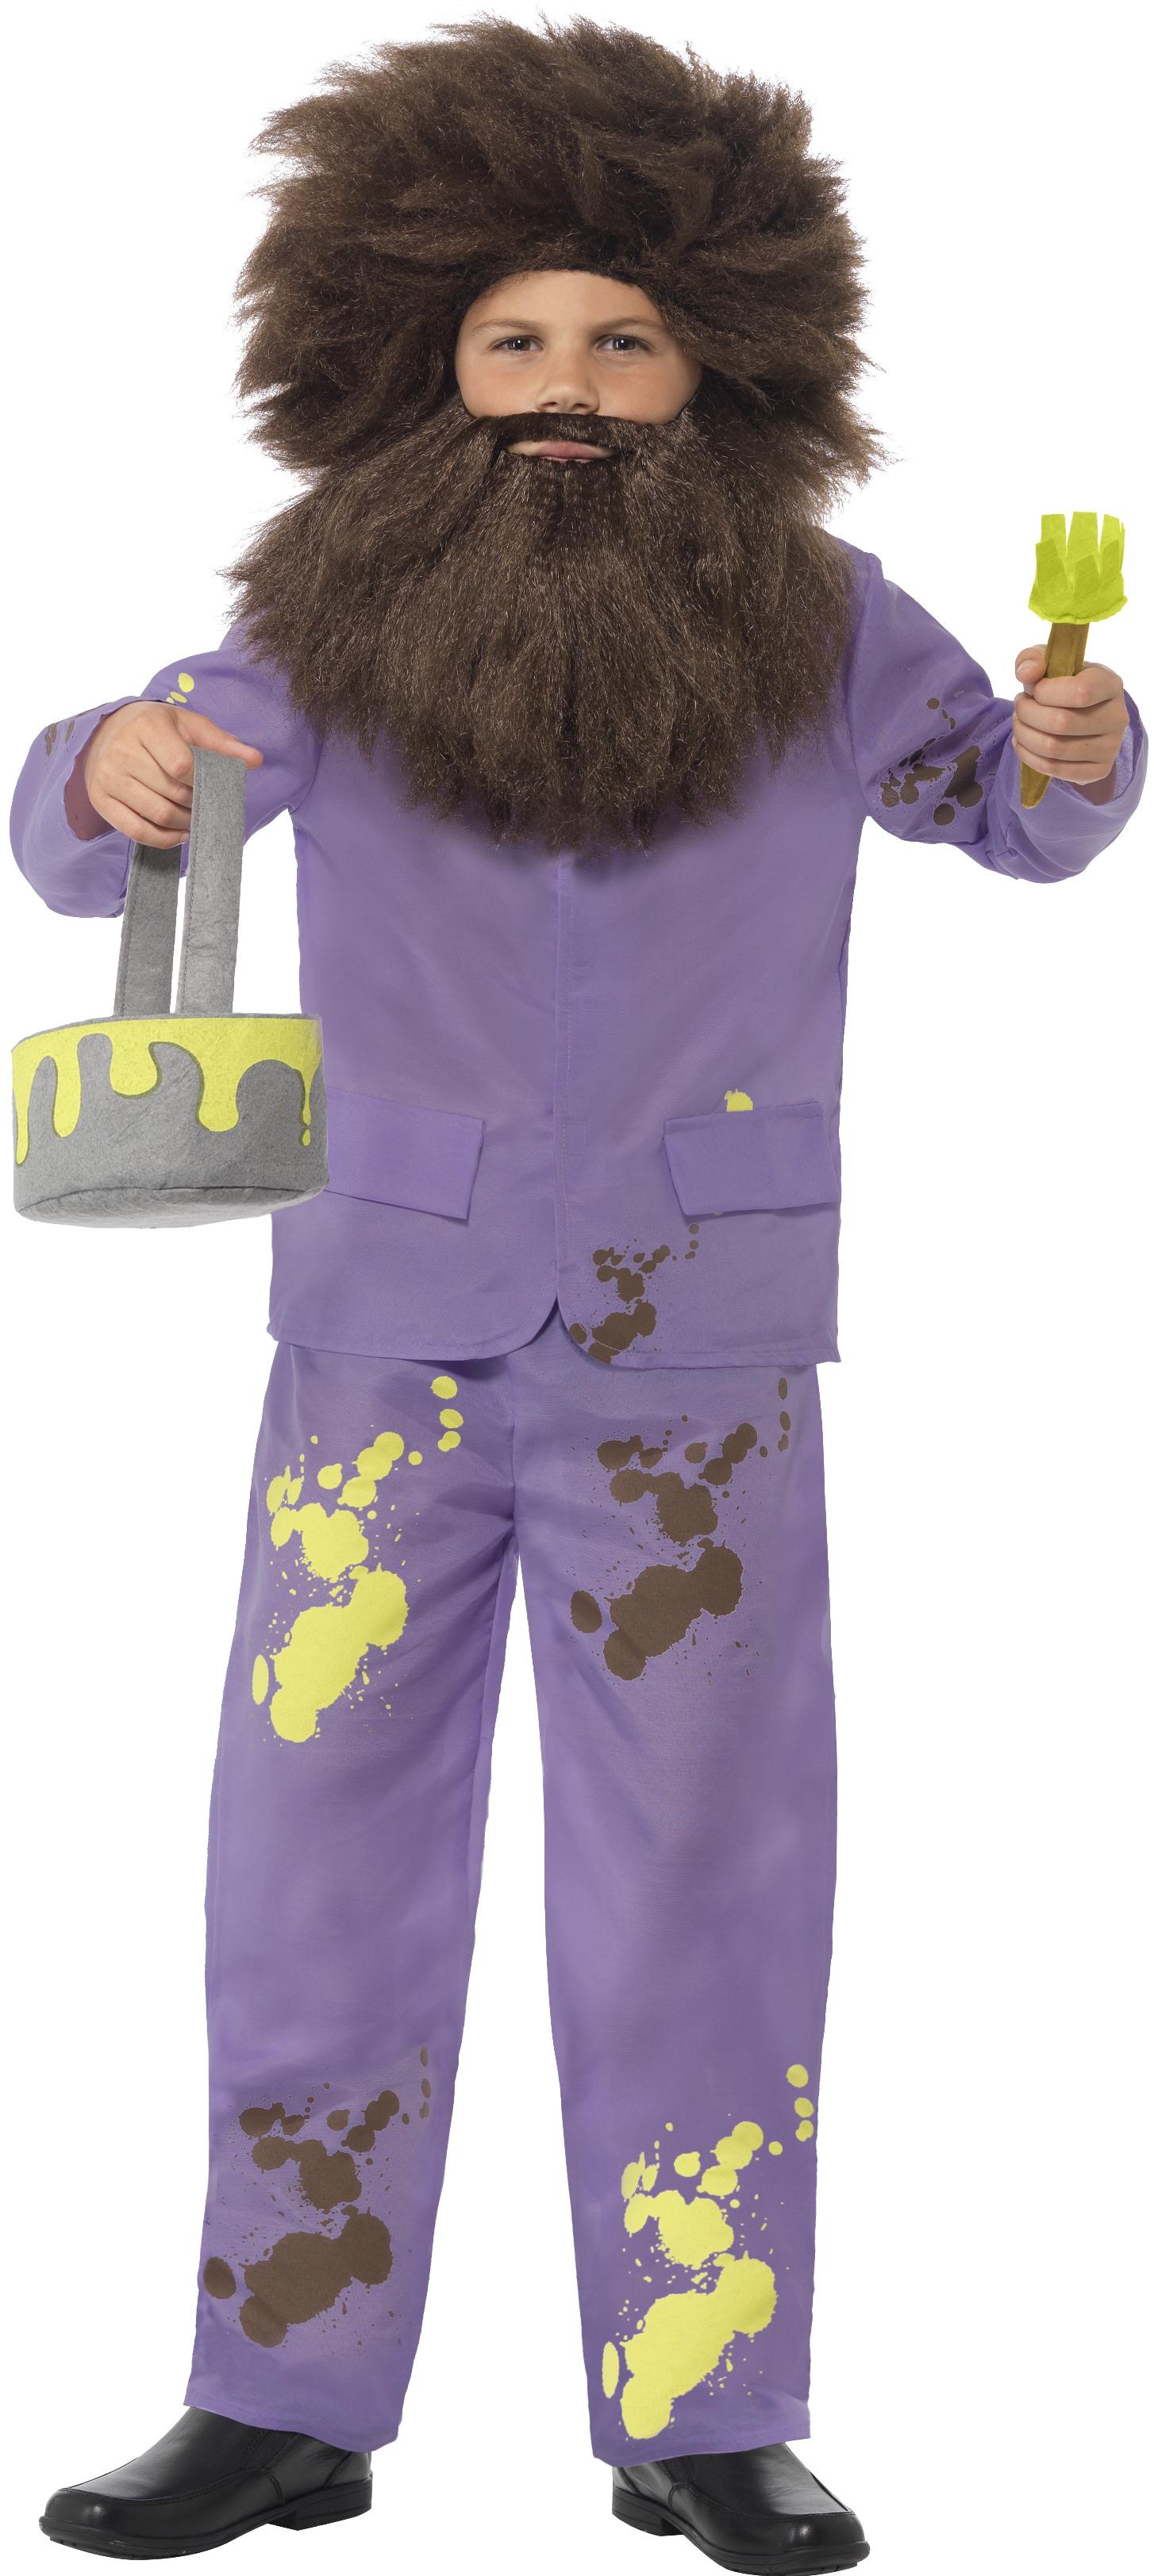 Roald Dahl Mr Twit Boys Costume | TV, Book and Film Costumes | Mega ...